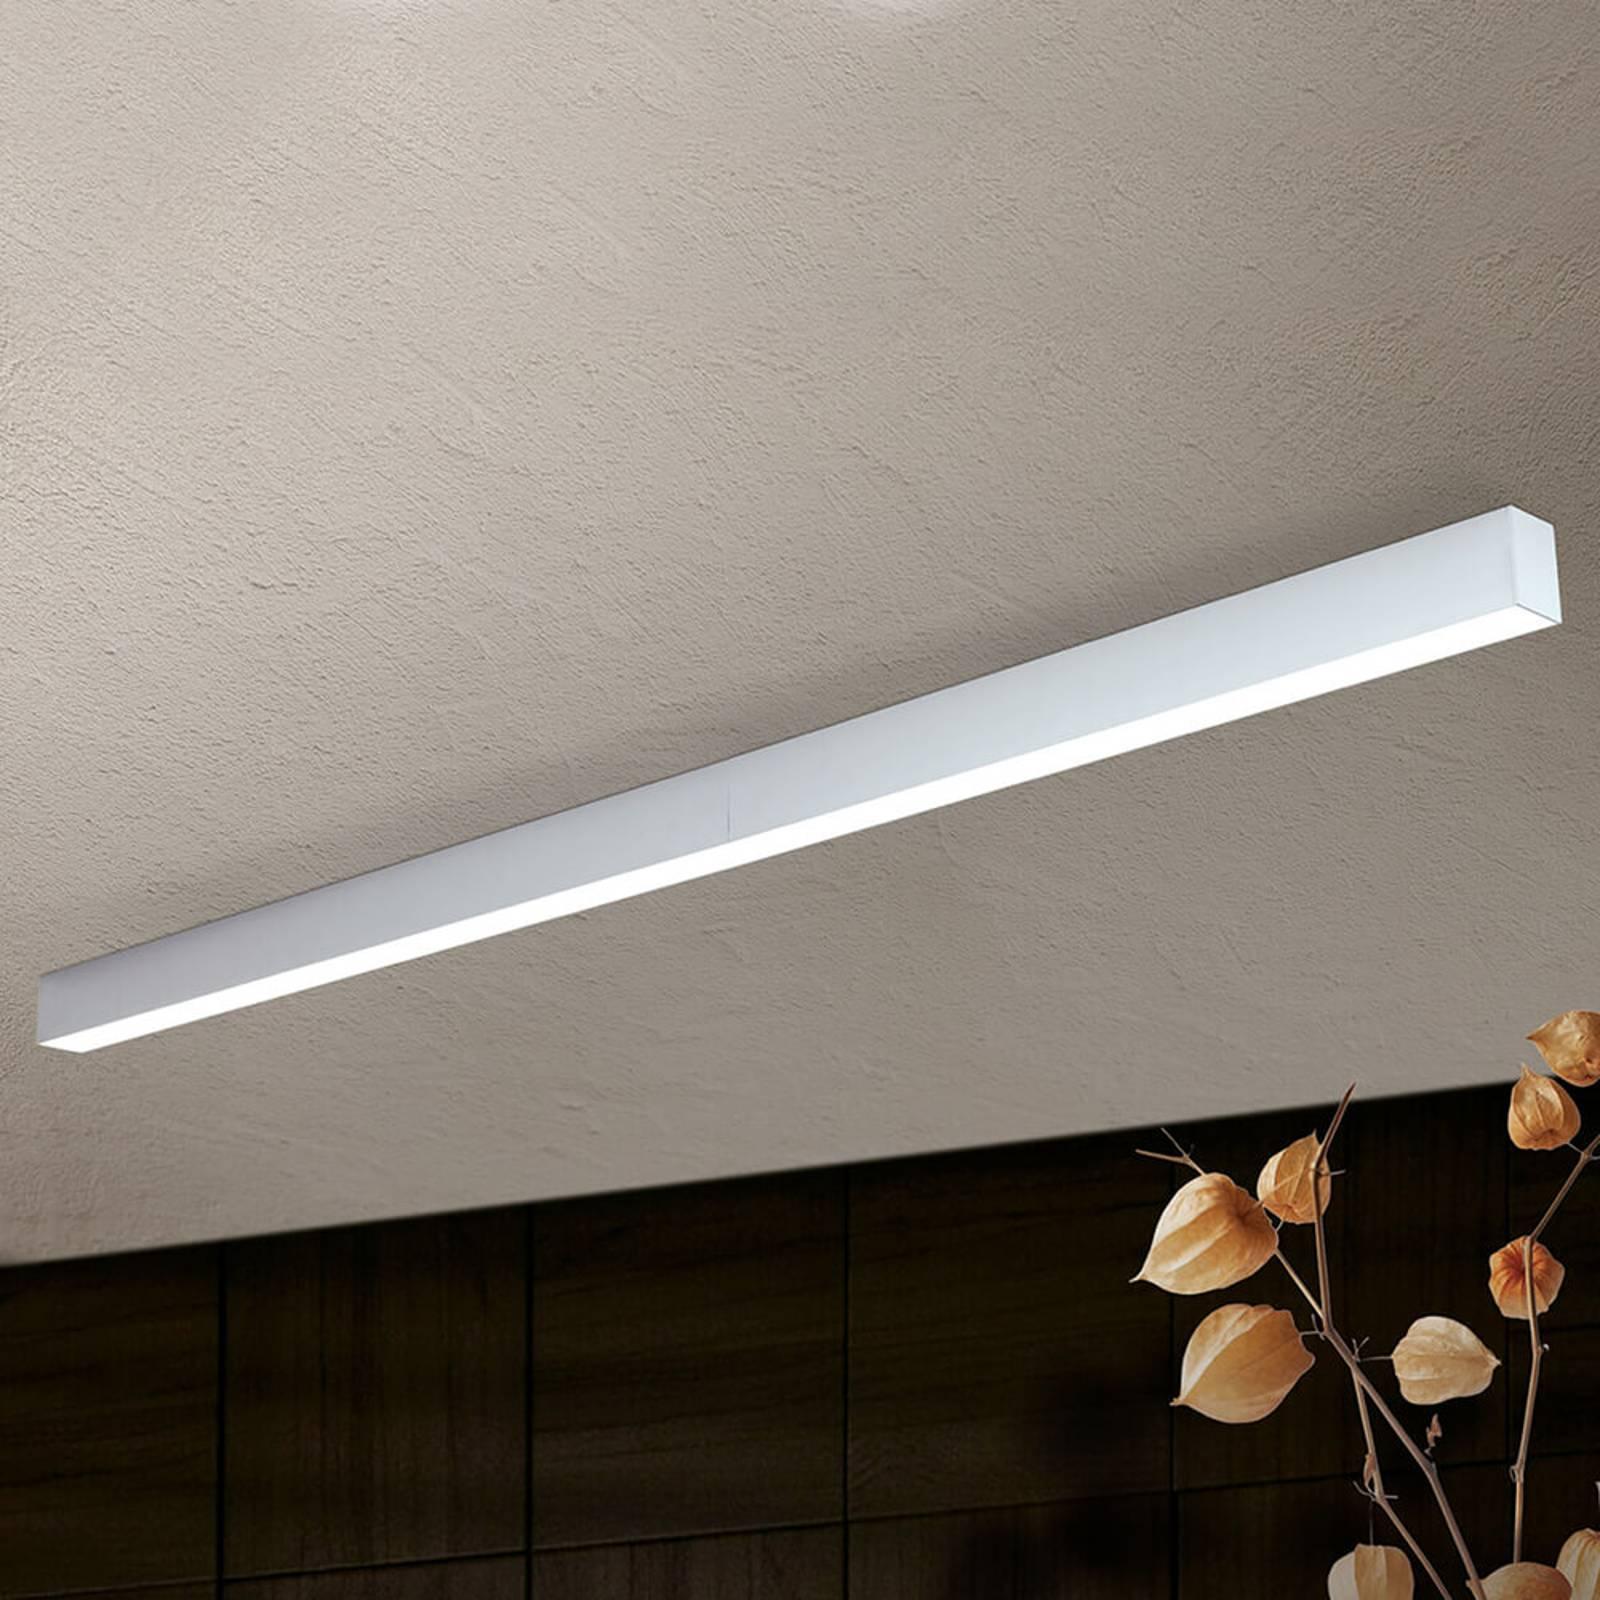 Lampa sufitowa LED Sando z zestawem, 114 cm